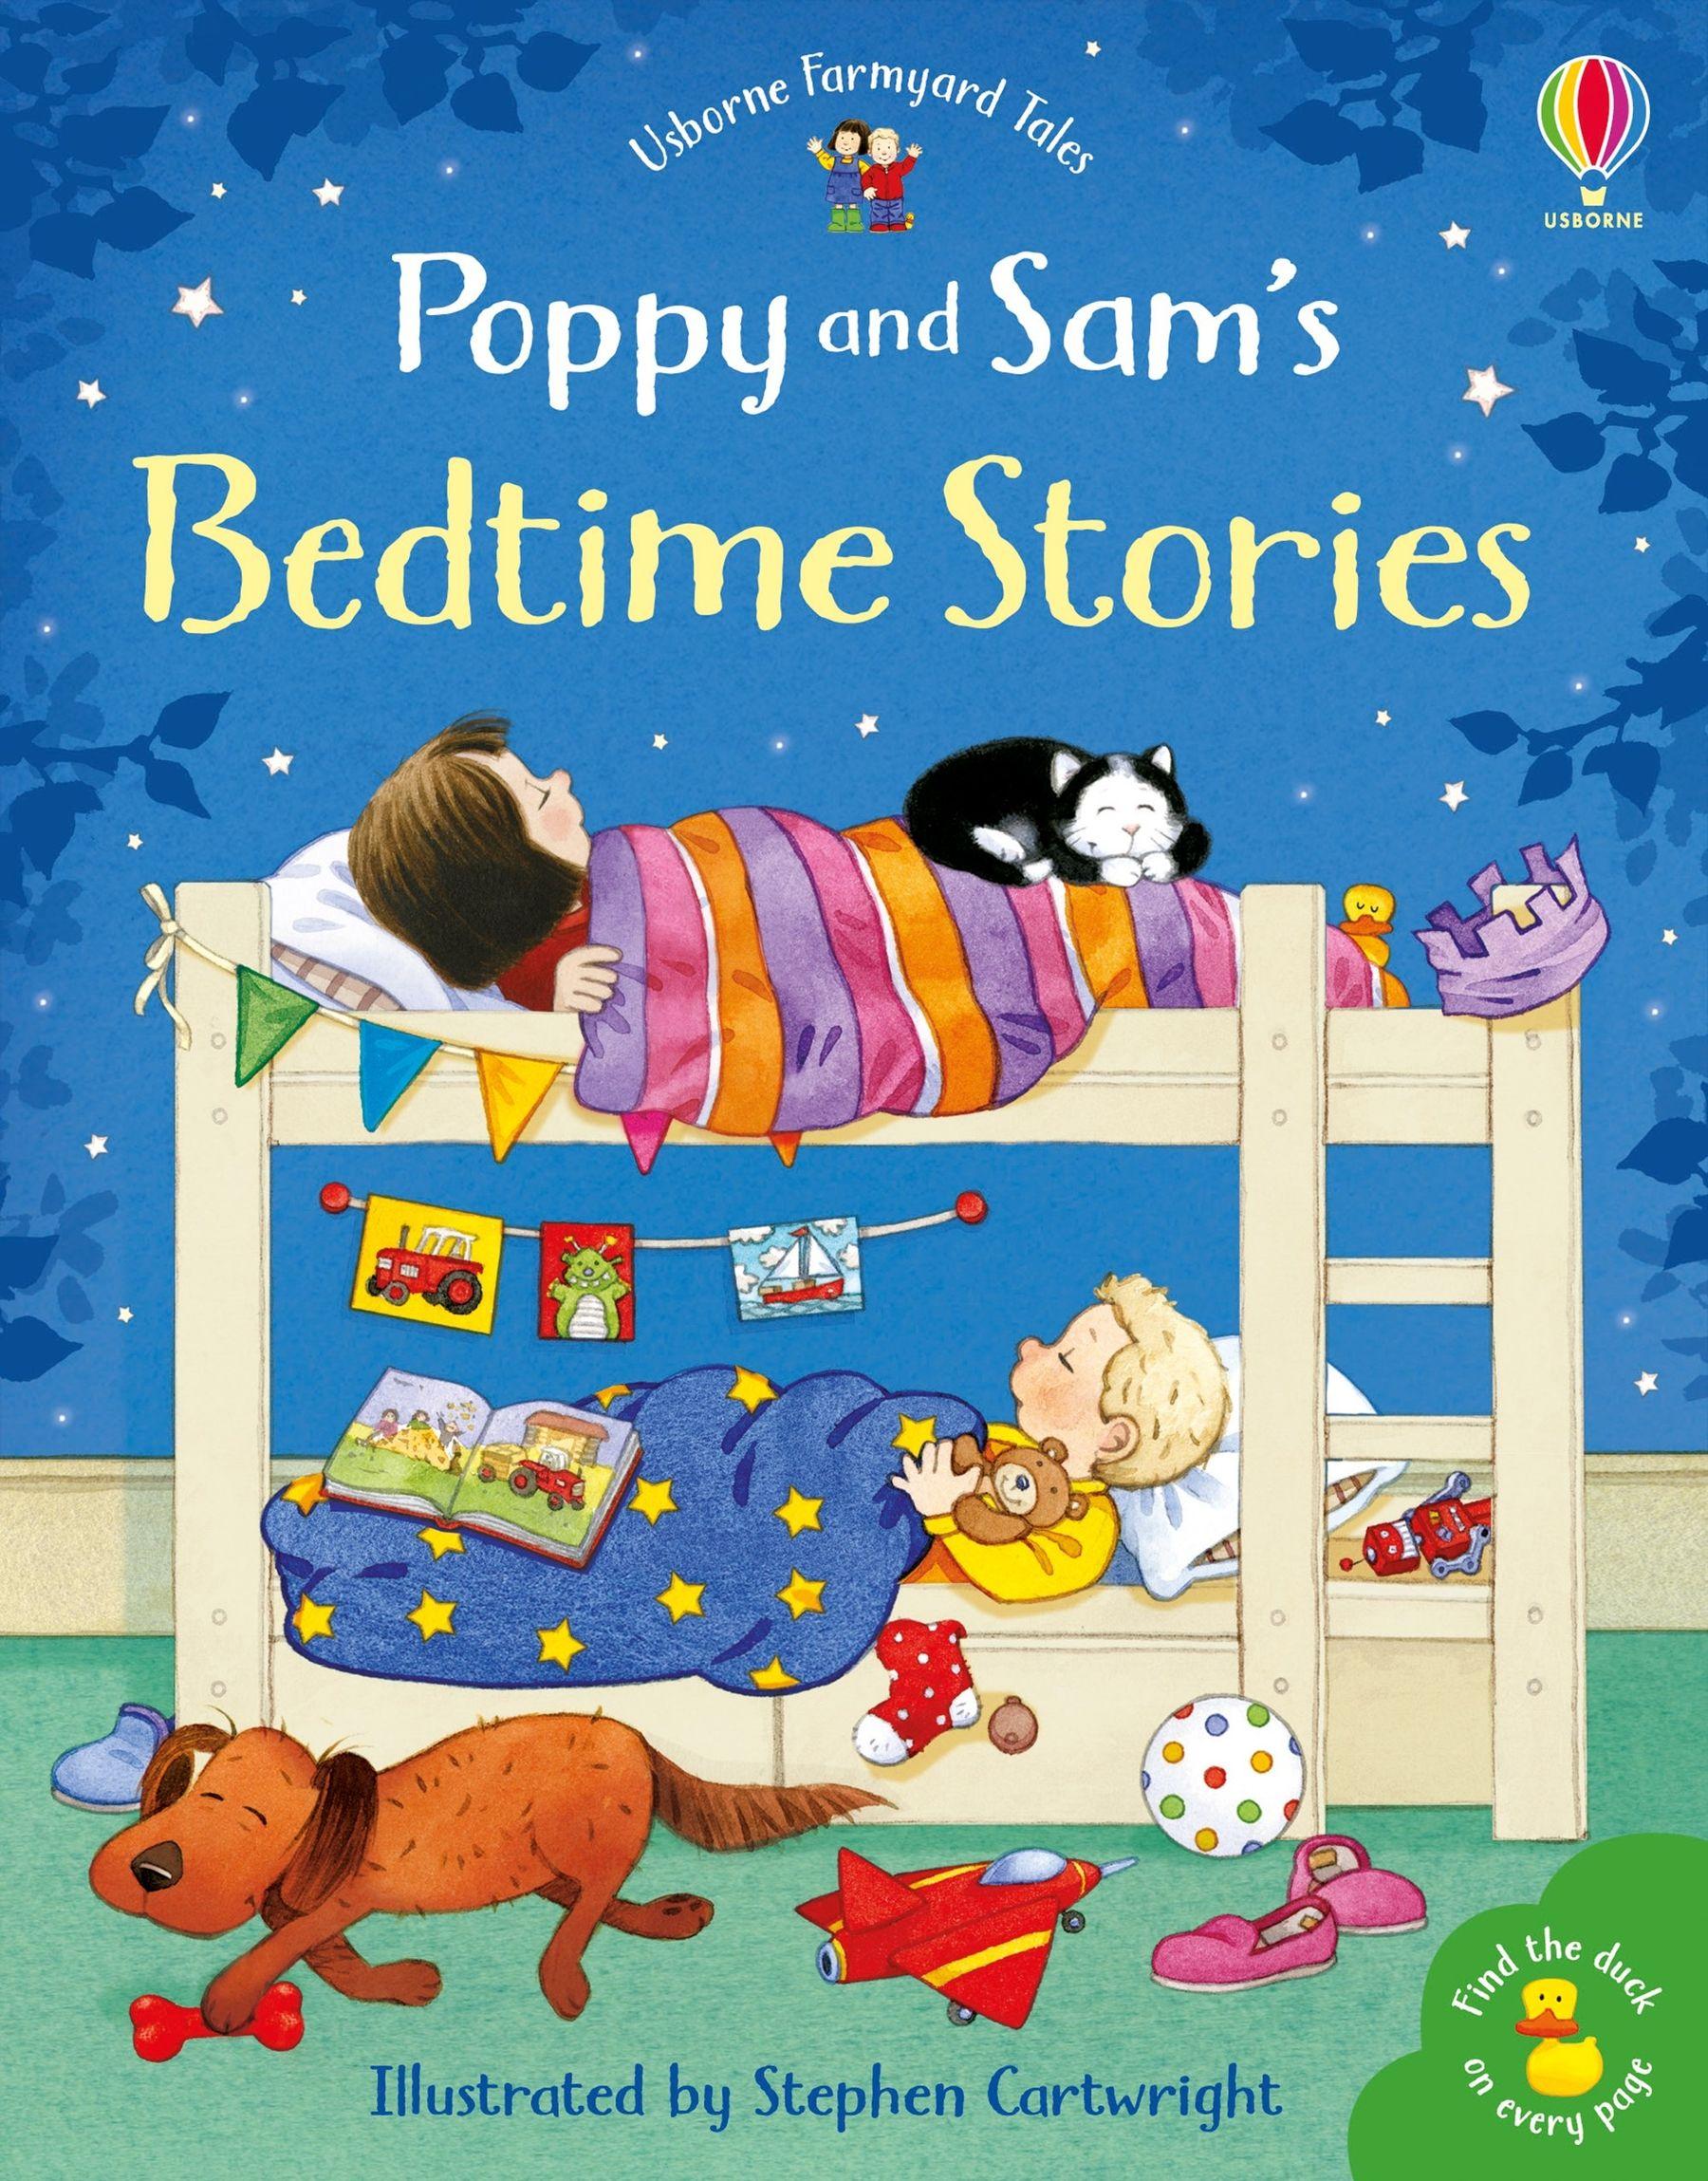 Poppy and Sam's Bedtime Stories Image